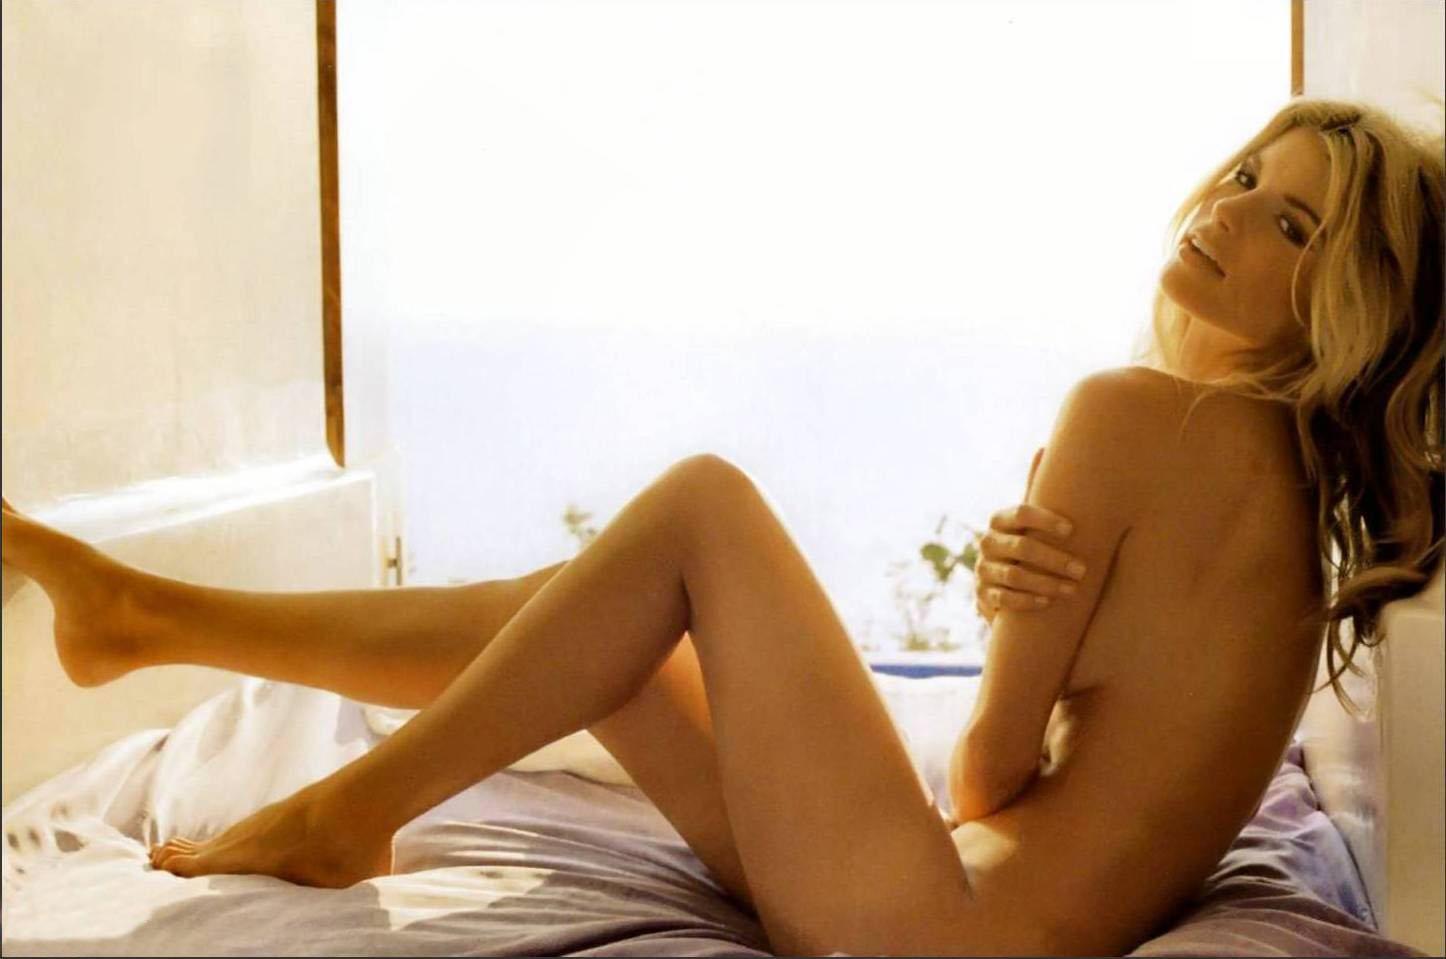 http://3.bp.blogspot.com/_qrmD8jCqKjE/TP-5EBz9a0I/AAAAAAAAMm8/_jfg4Al5L-w/s1600/marisa-miller-no-clothes-2.jpg